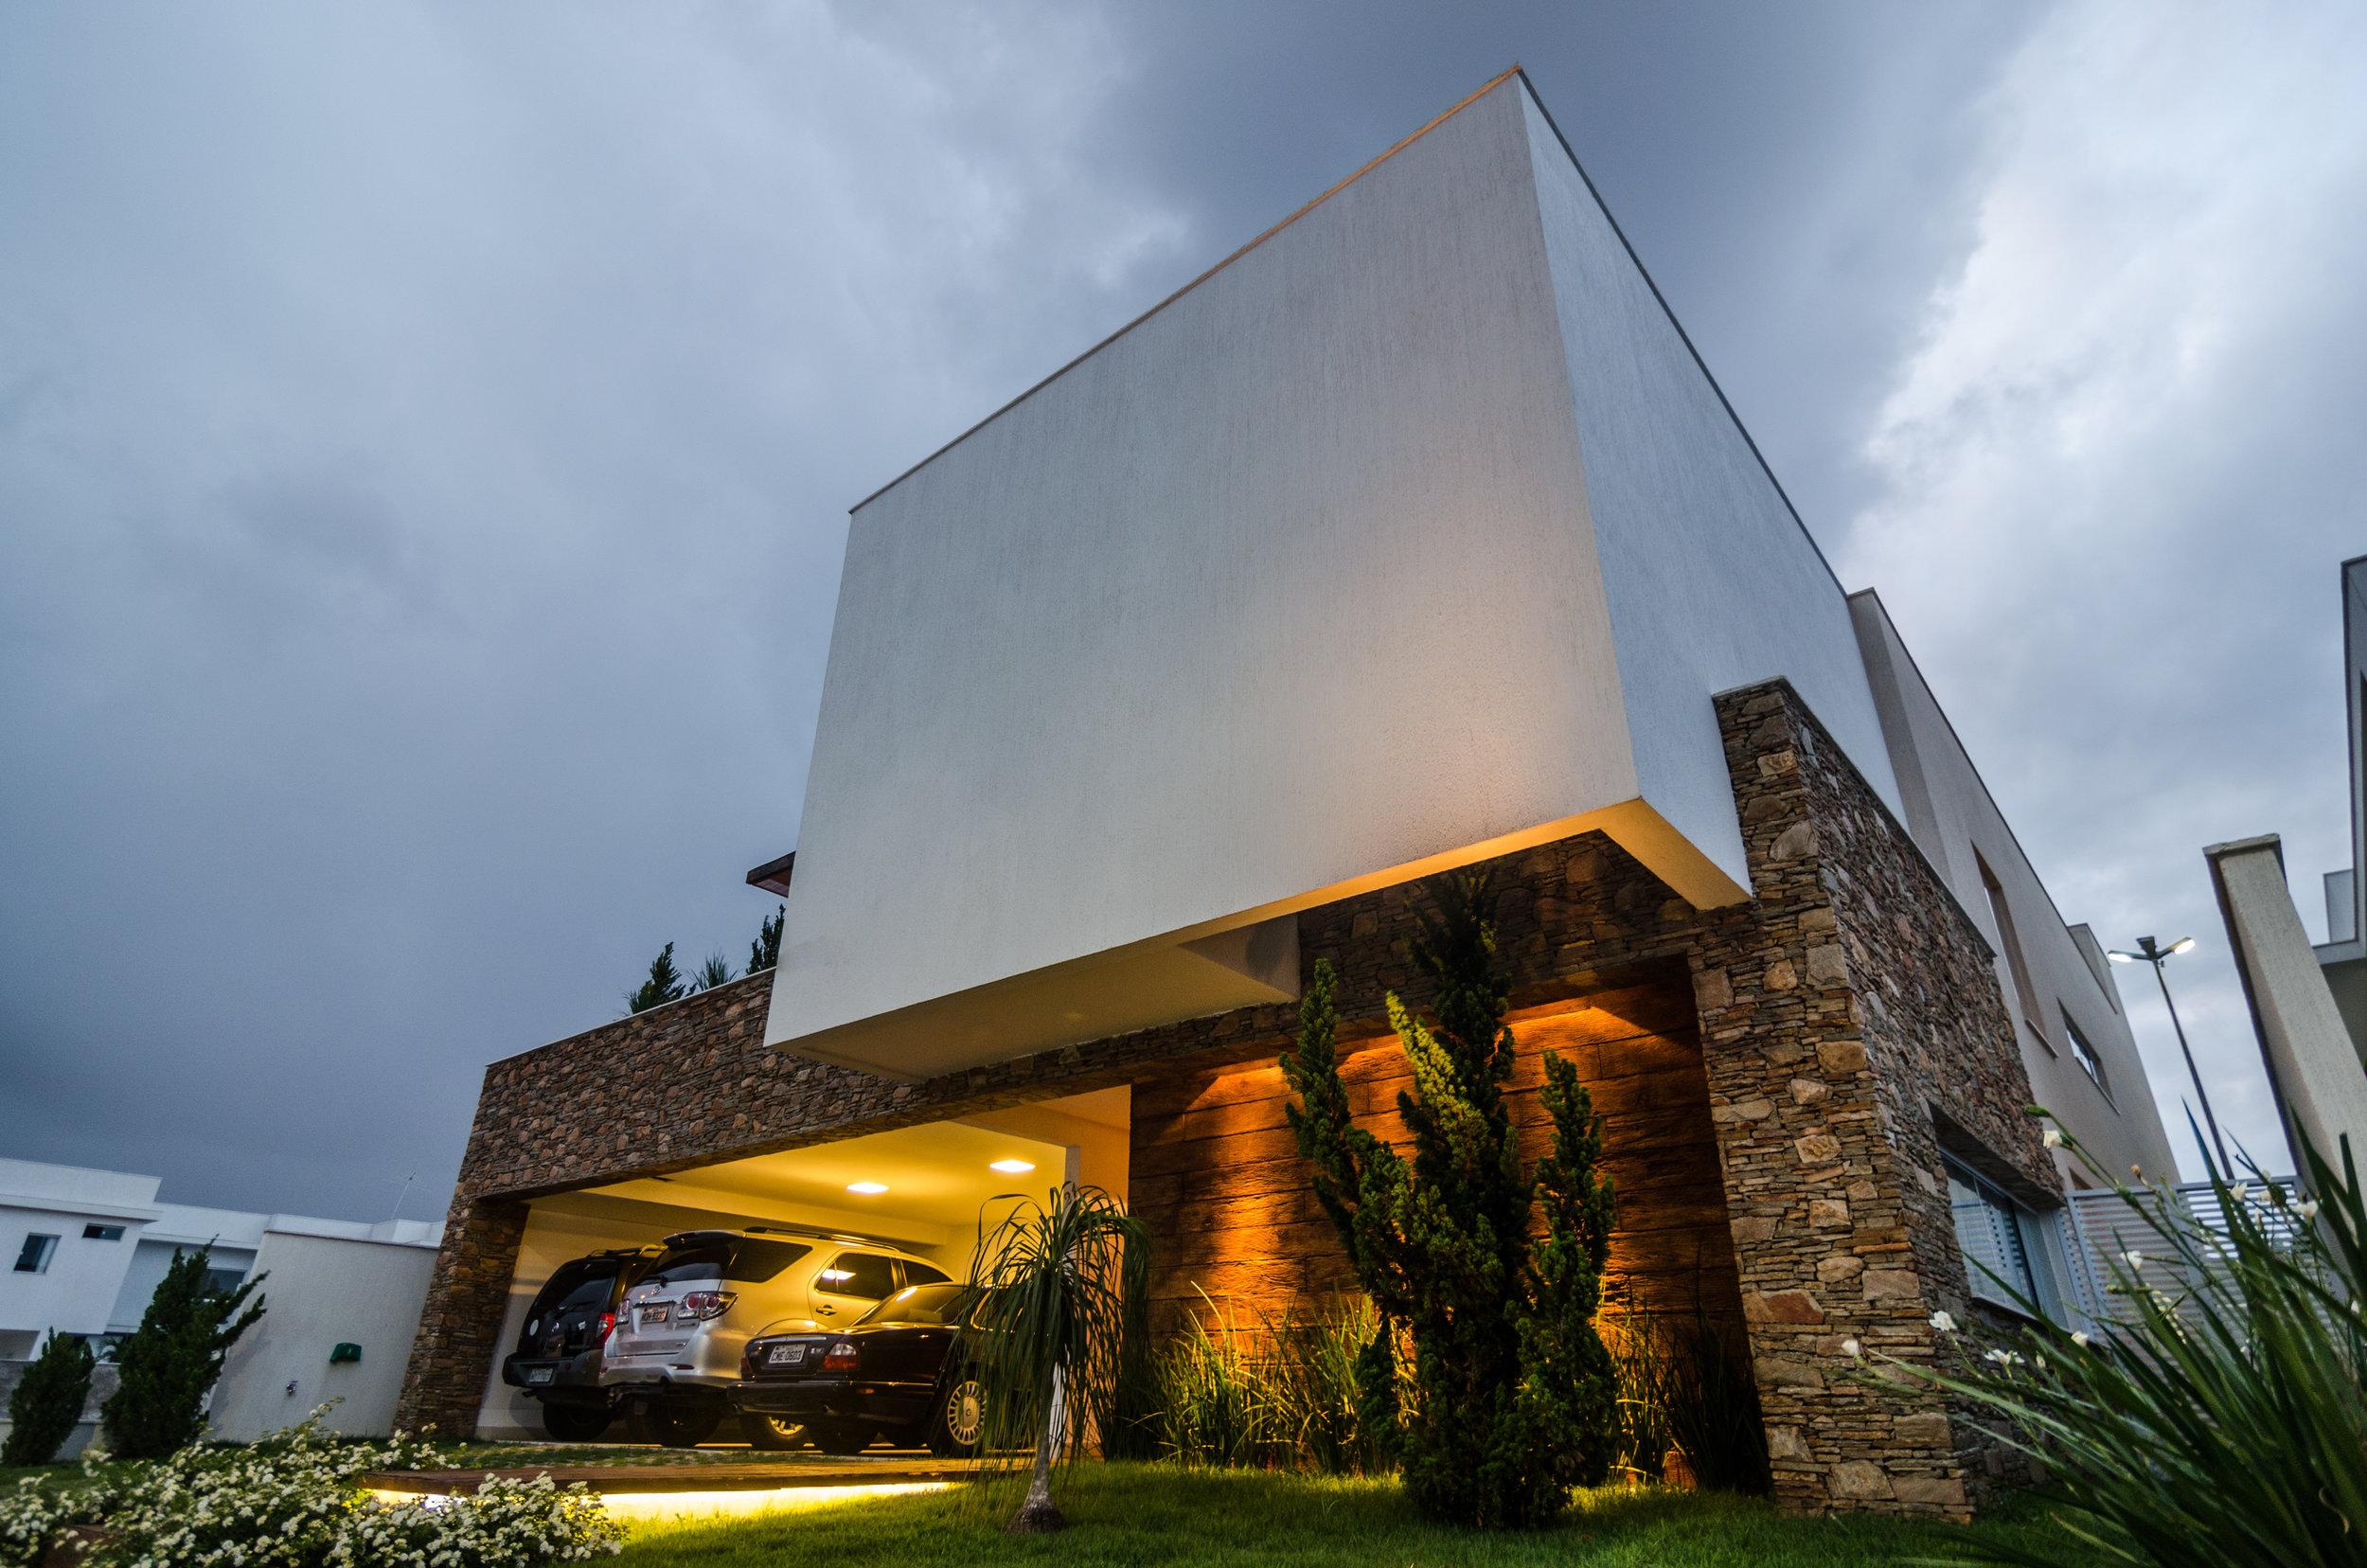 projeto-arquitetonico-alexandrepinto-duo-arquitetura-casa-02.jpg